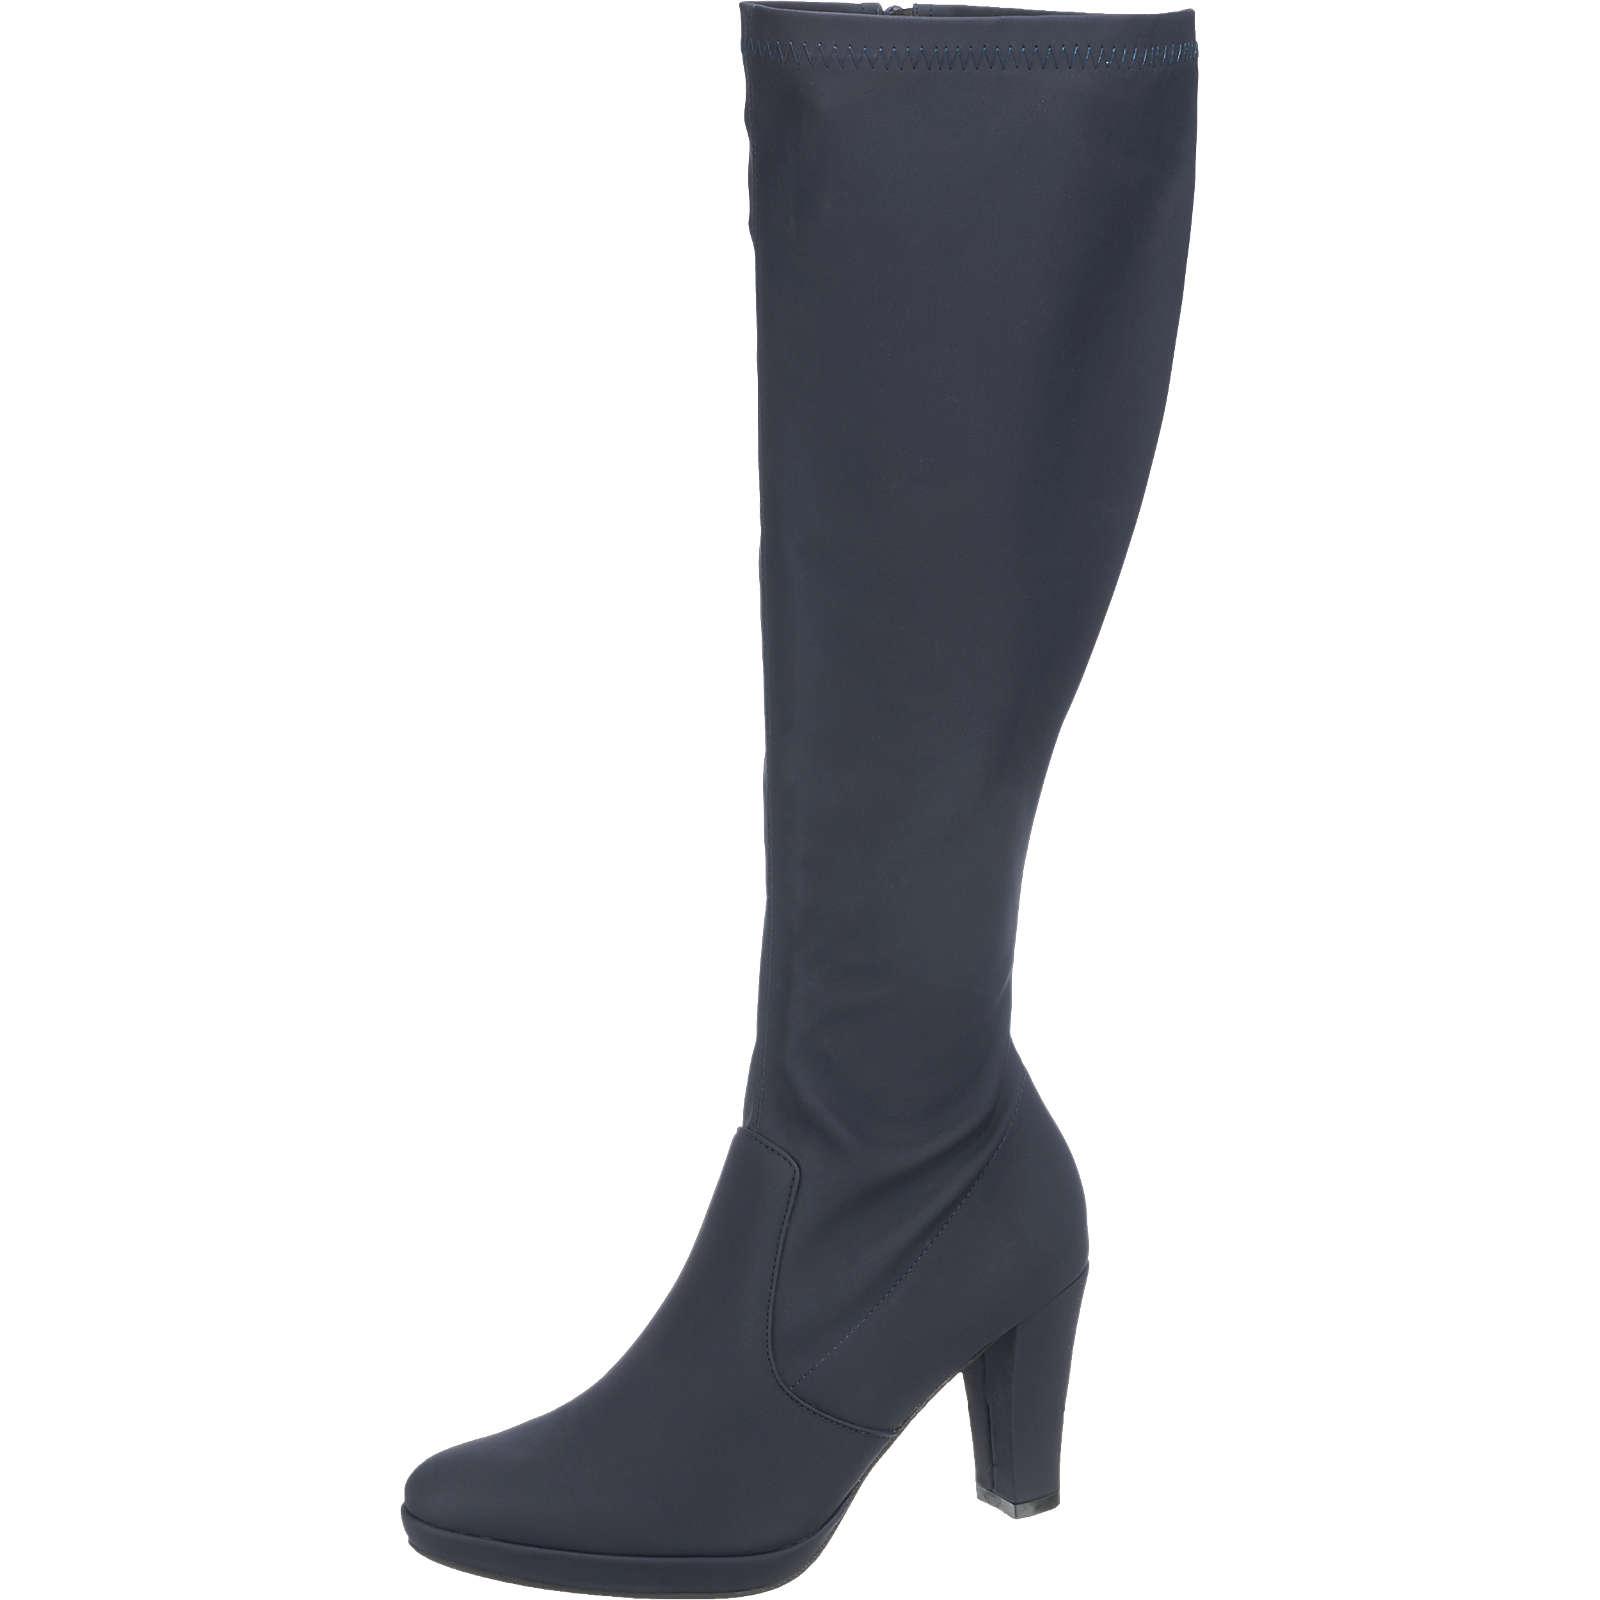 Andrea Conti Stiefel dunkelblau Damen Gr. 40 jetztbilligerkaufen